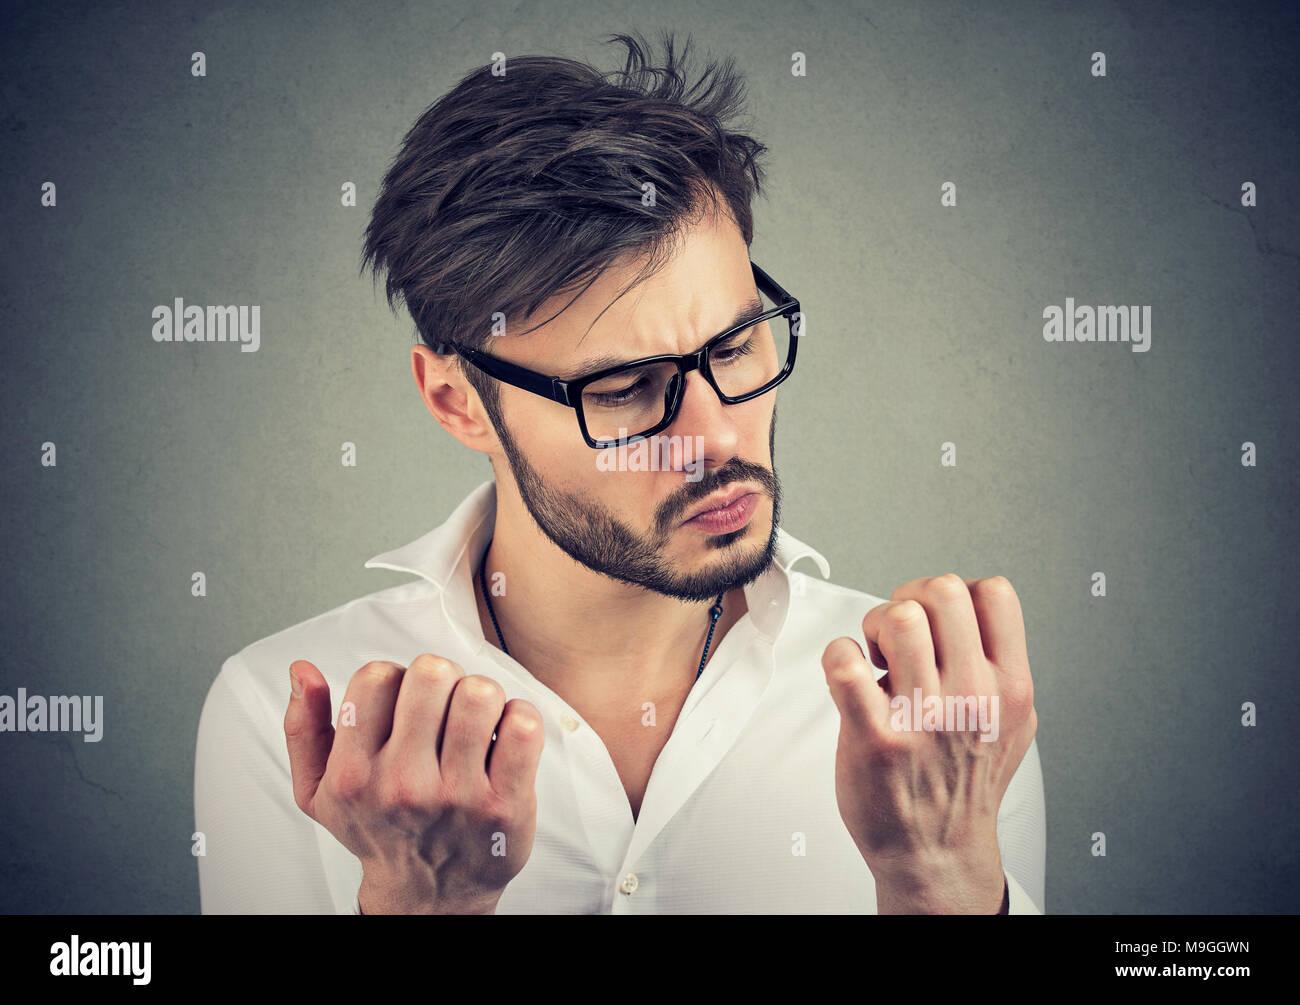 Obsessive Behavior Stock Photos Amp Obsessive Behavior Stock